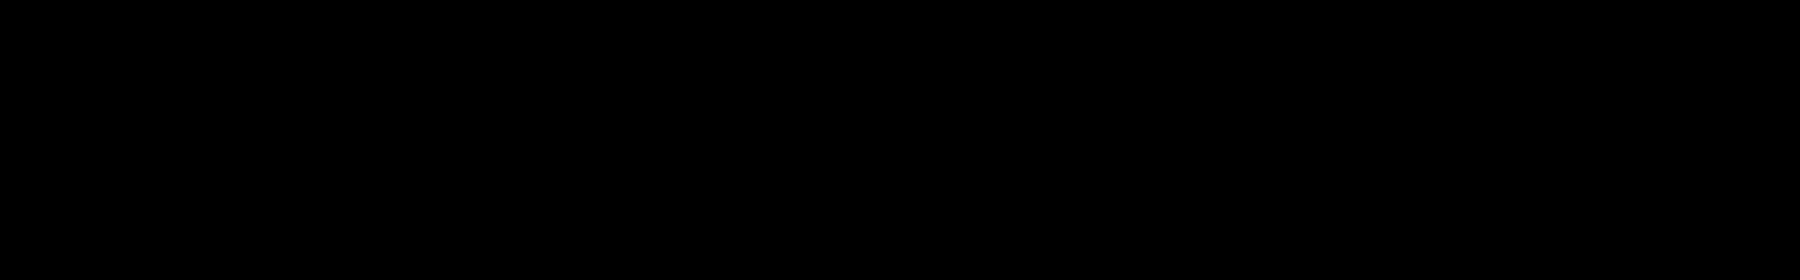 Mutombo - Cowbells & Blocks by Basement Freaks audio waveform